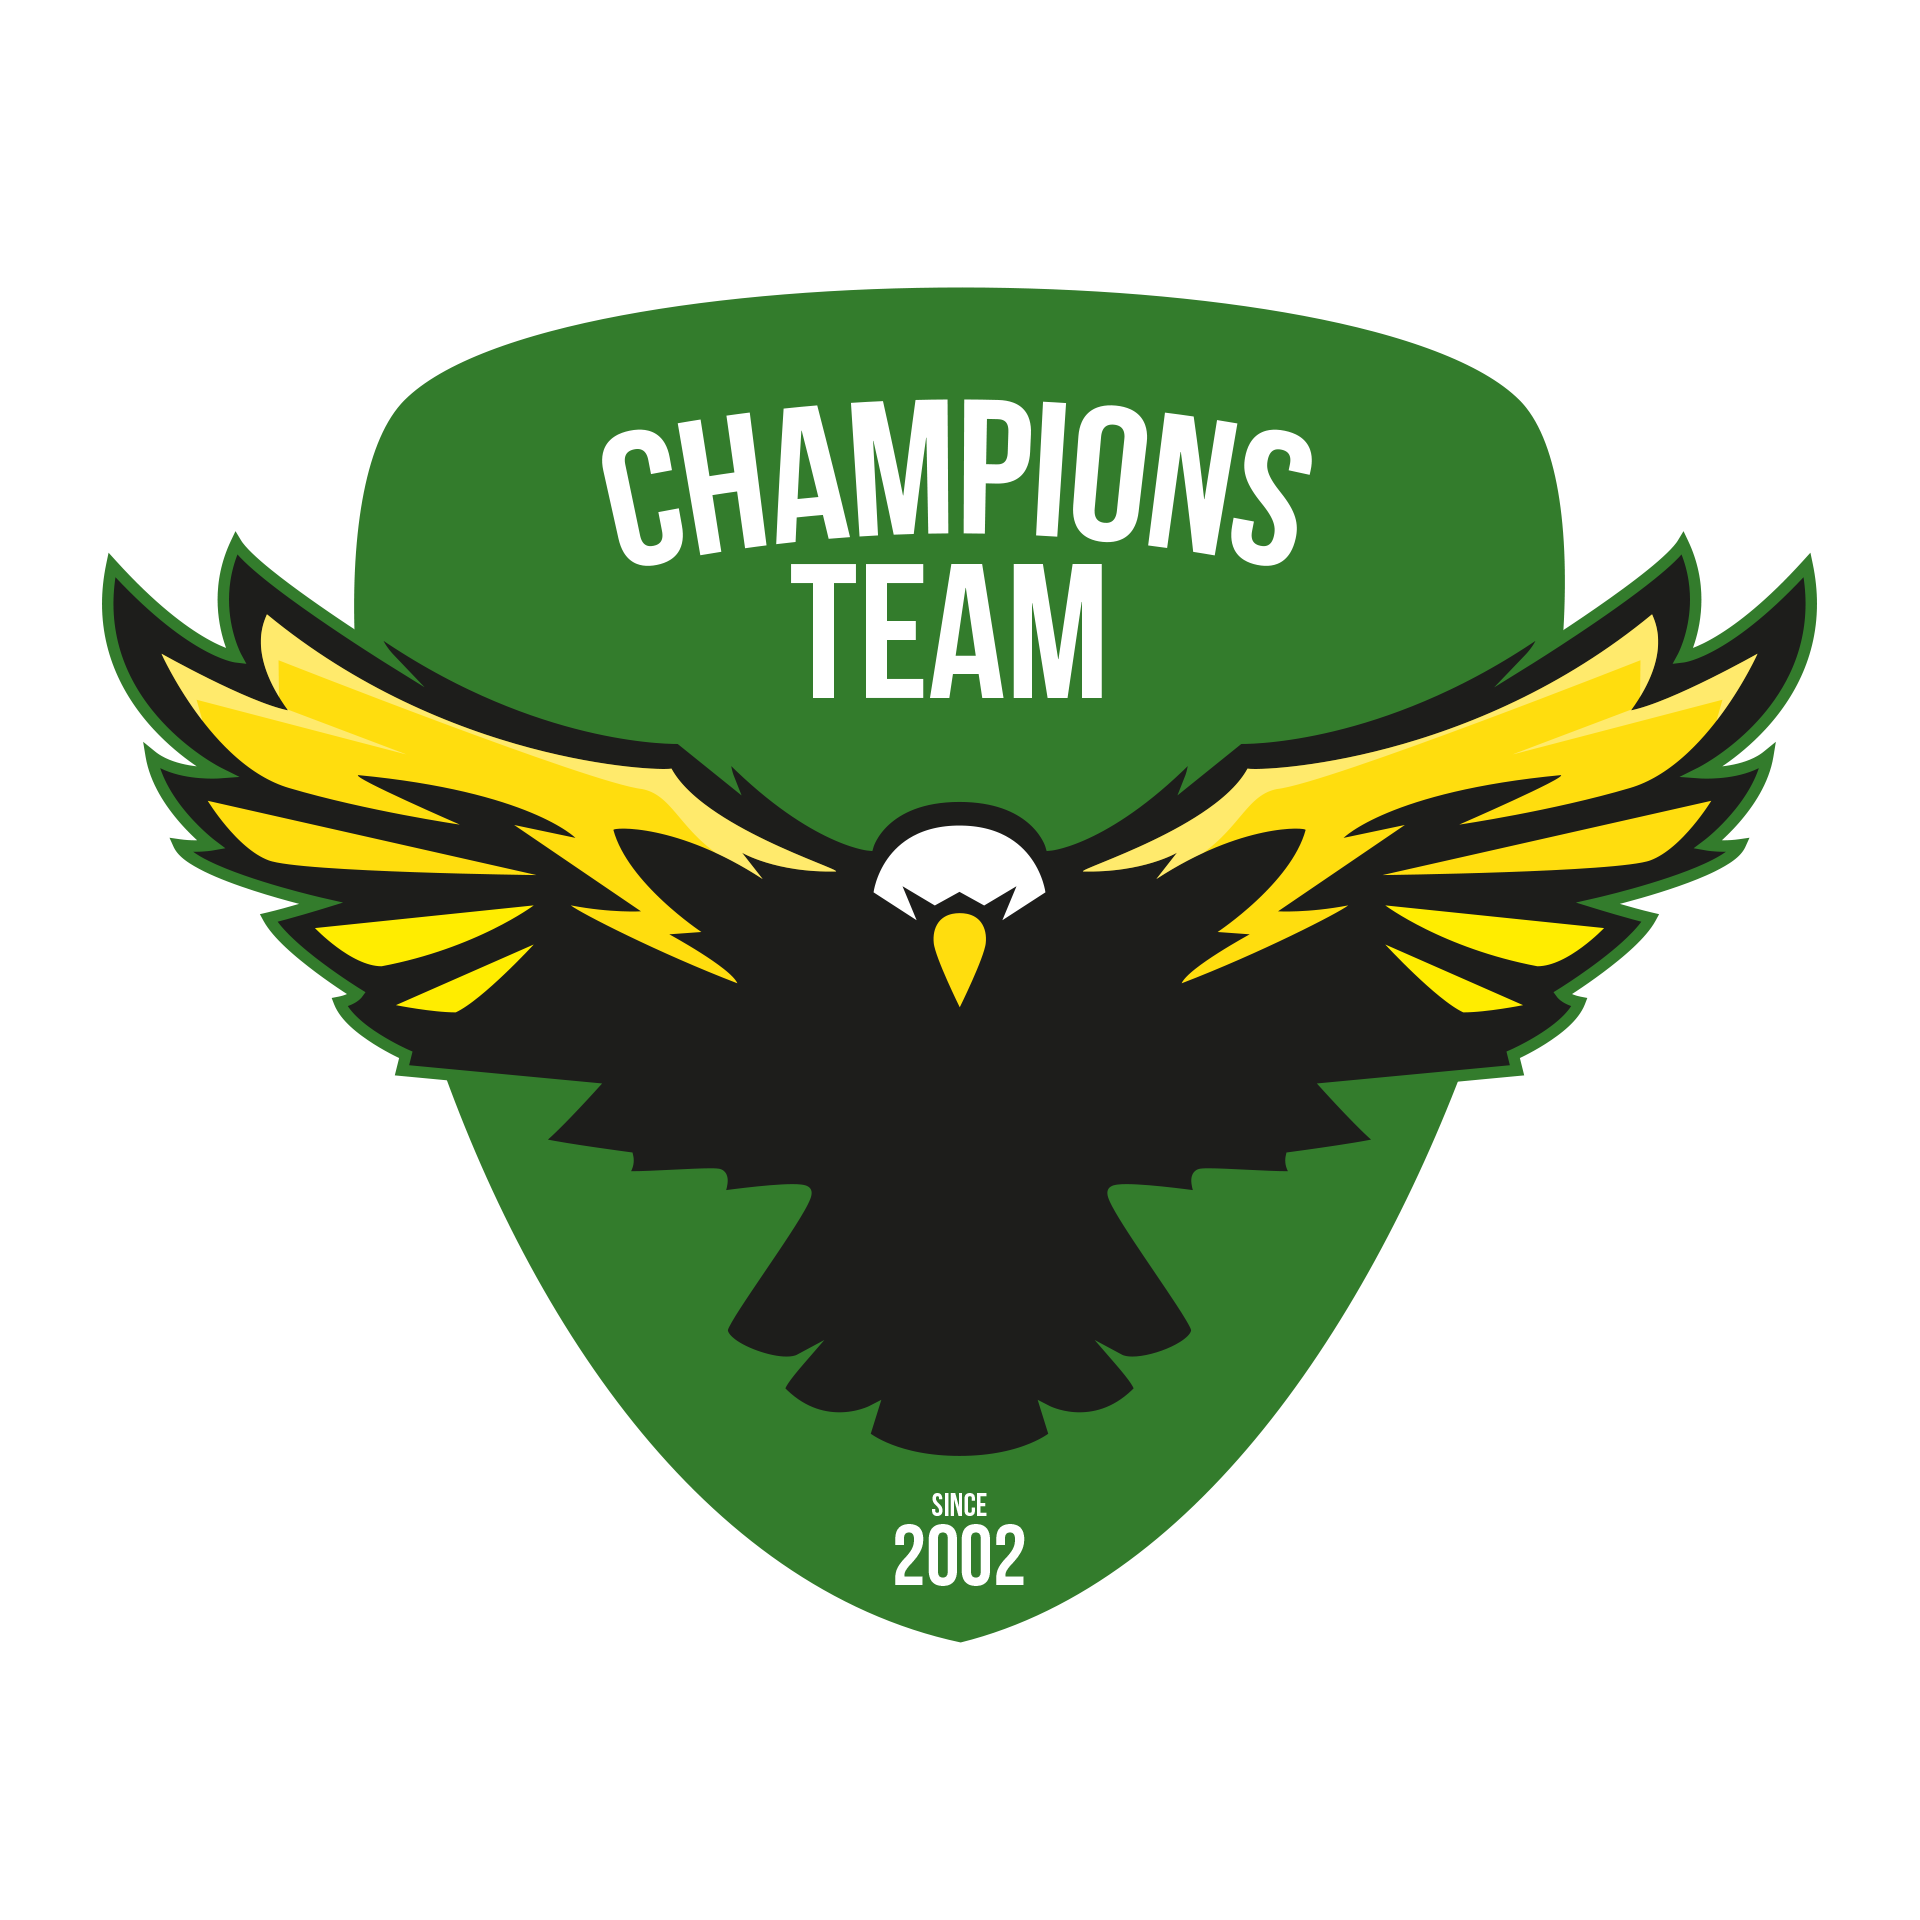 Liga Rezerw: Speedi liderem Champions Team